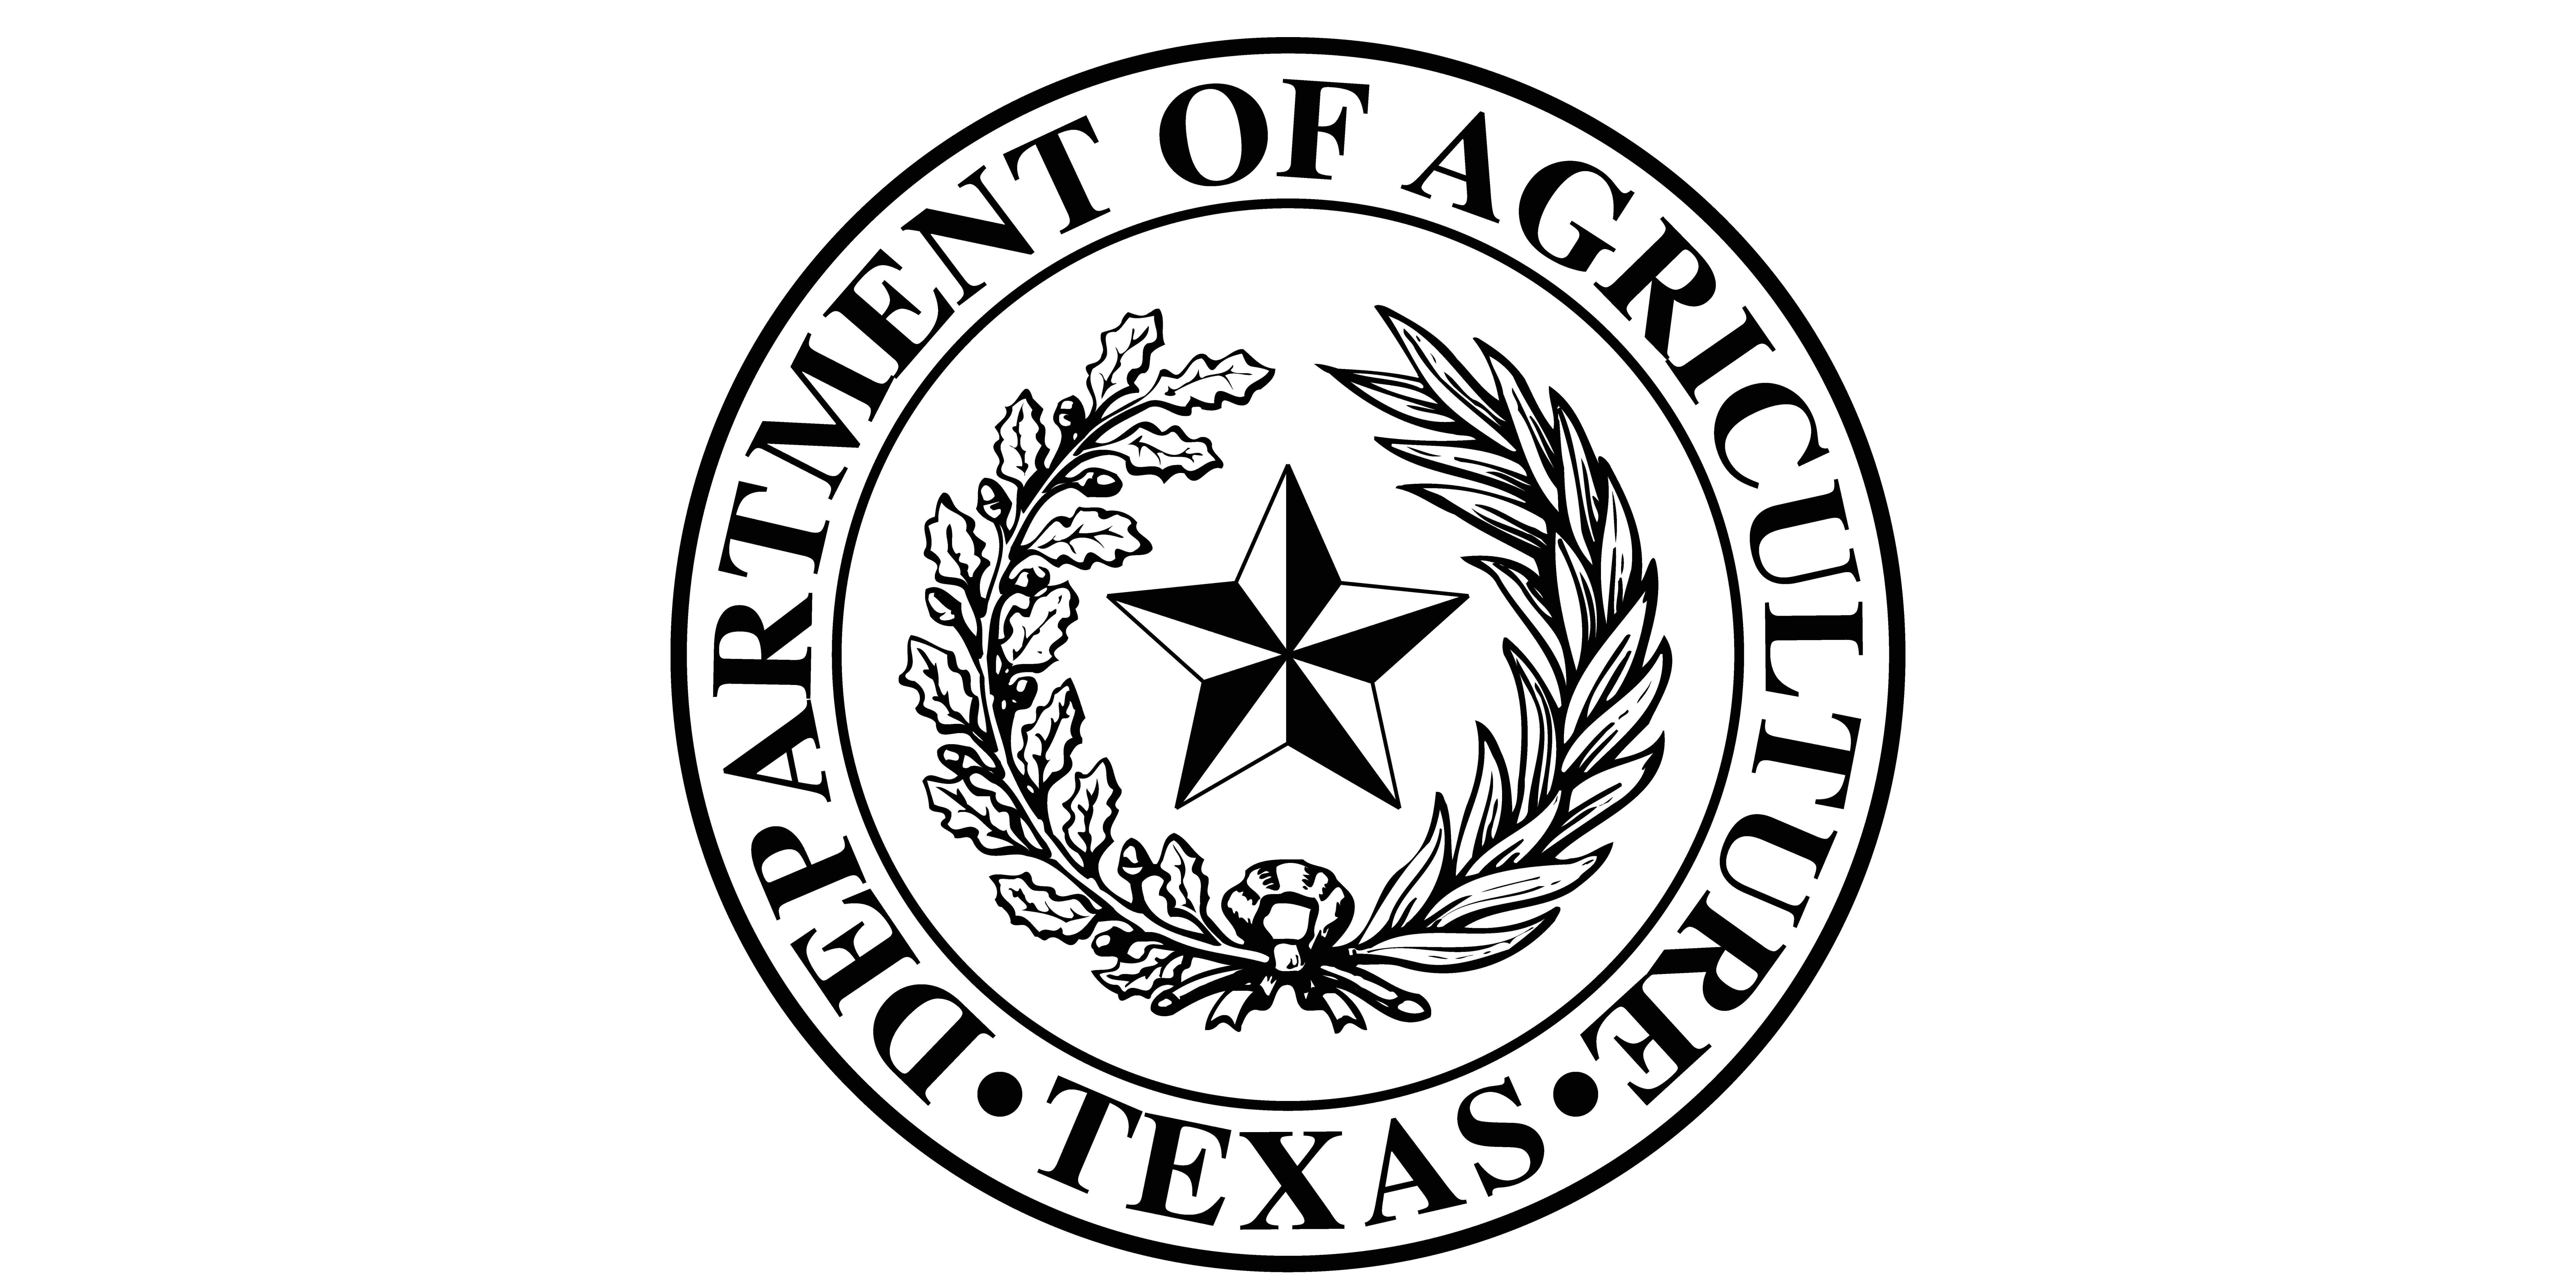 TDA_Seal_TX_Rural_Challenge